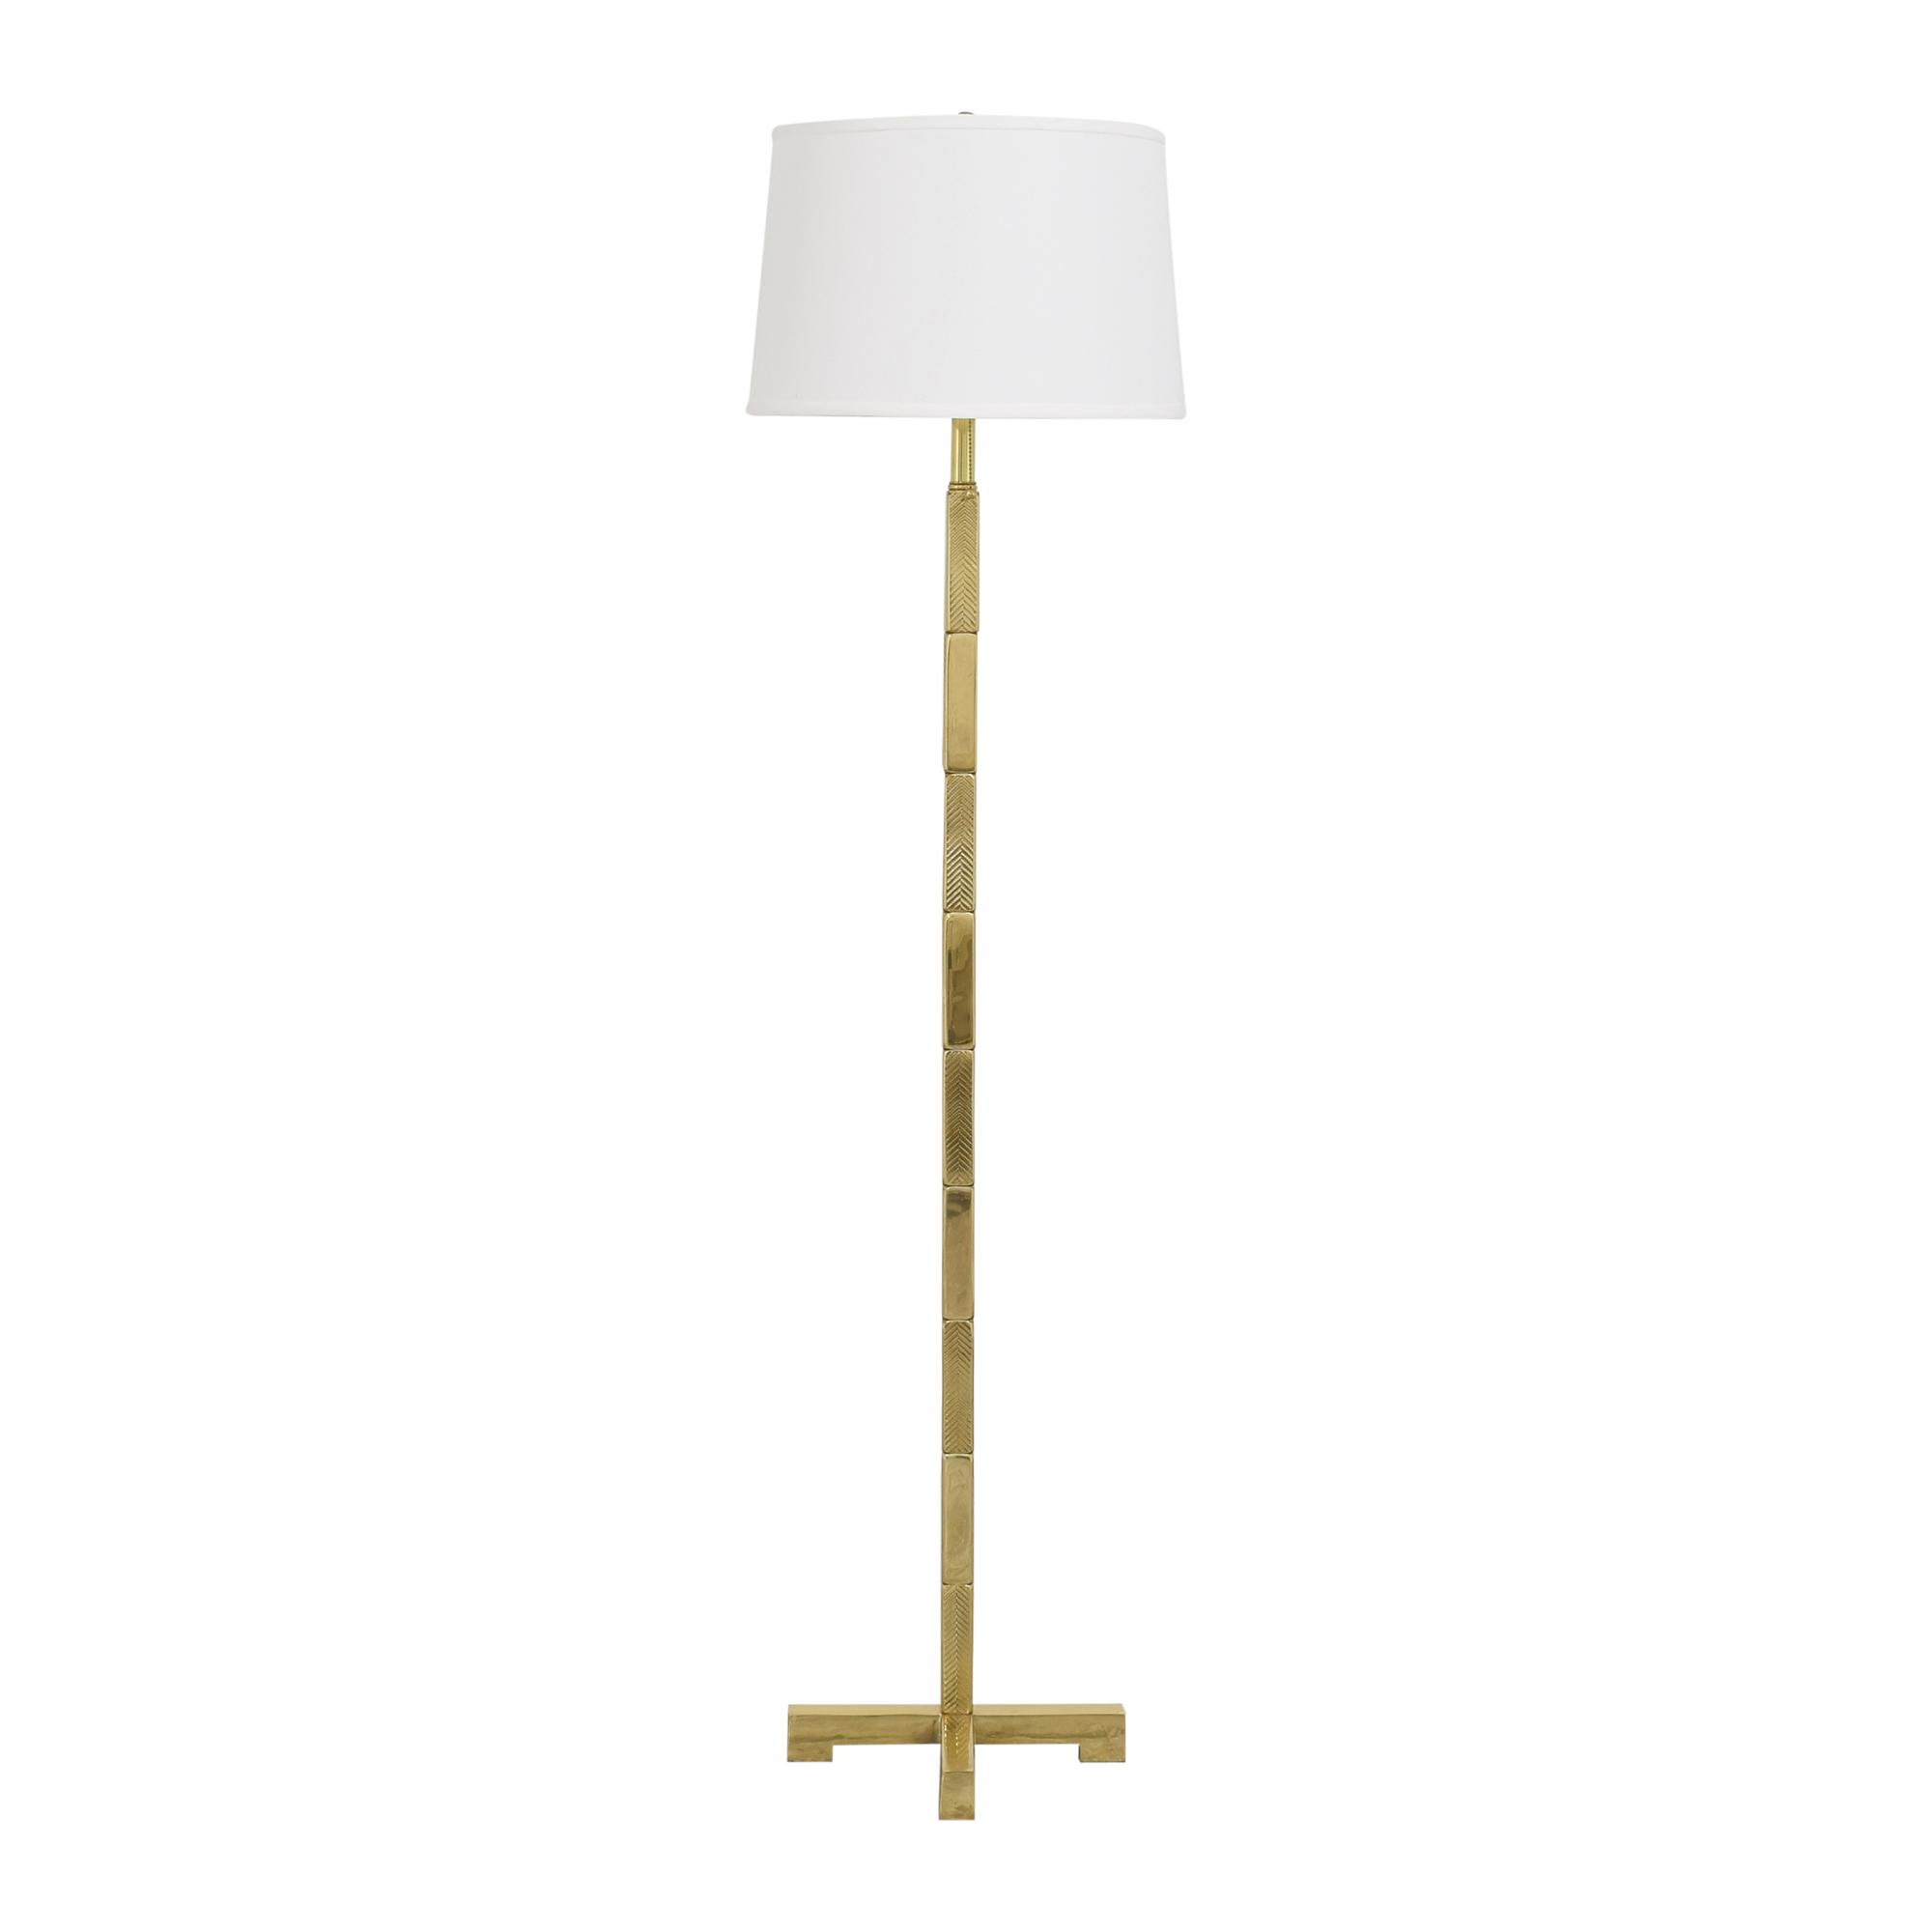 Bungalow 5 Bungalow 5 Albite Floor Lamp Decor